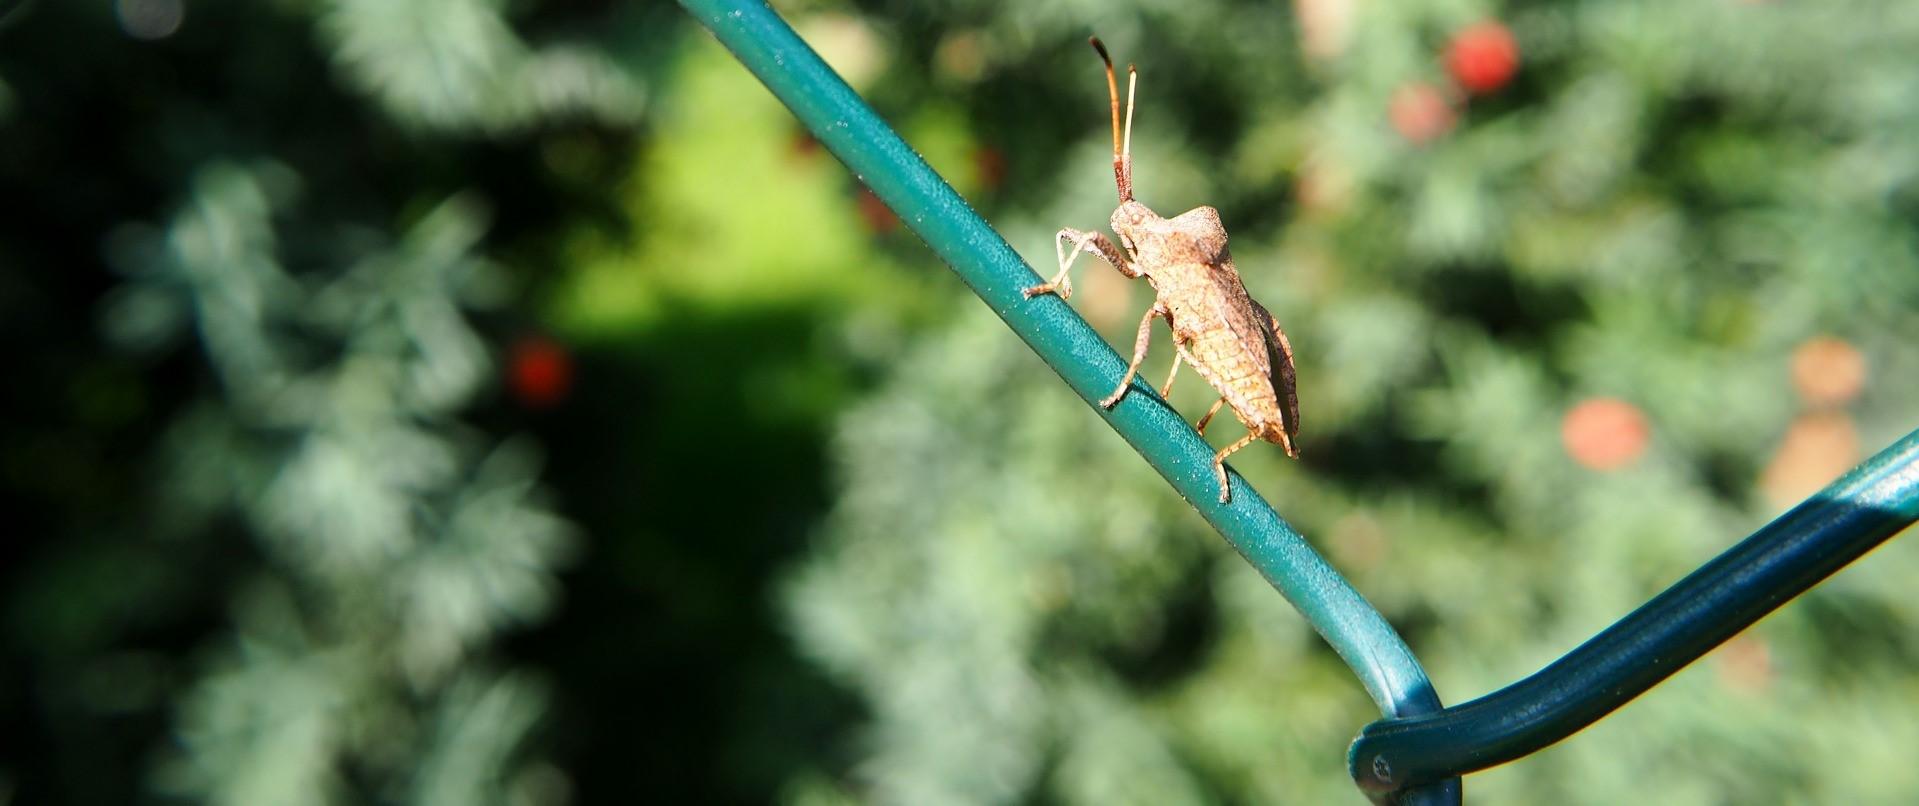 fence-2680715_1920.jpg